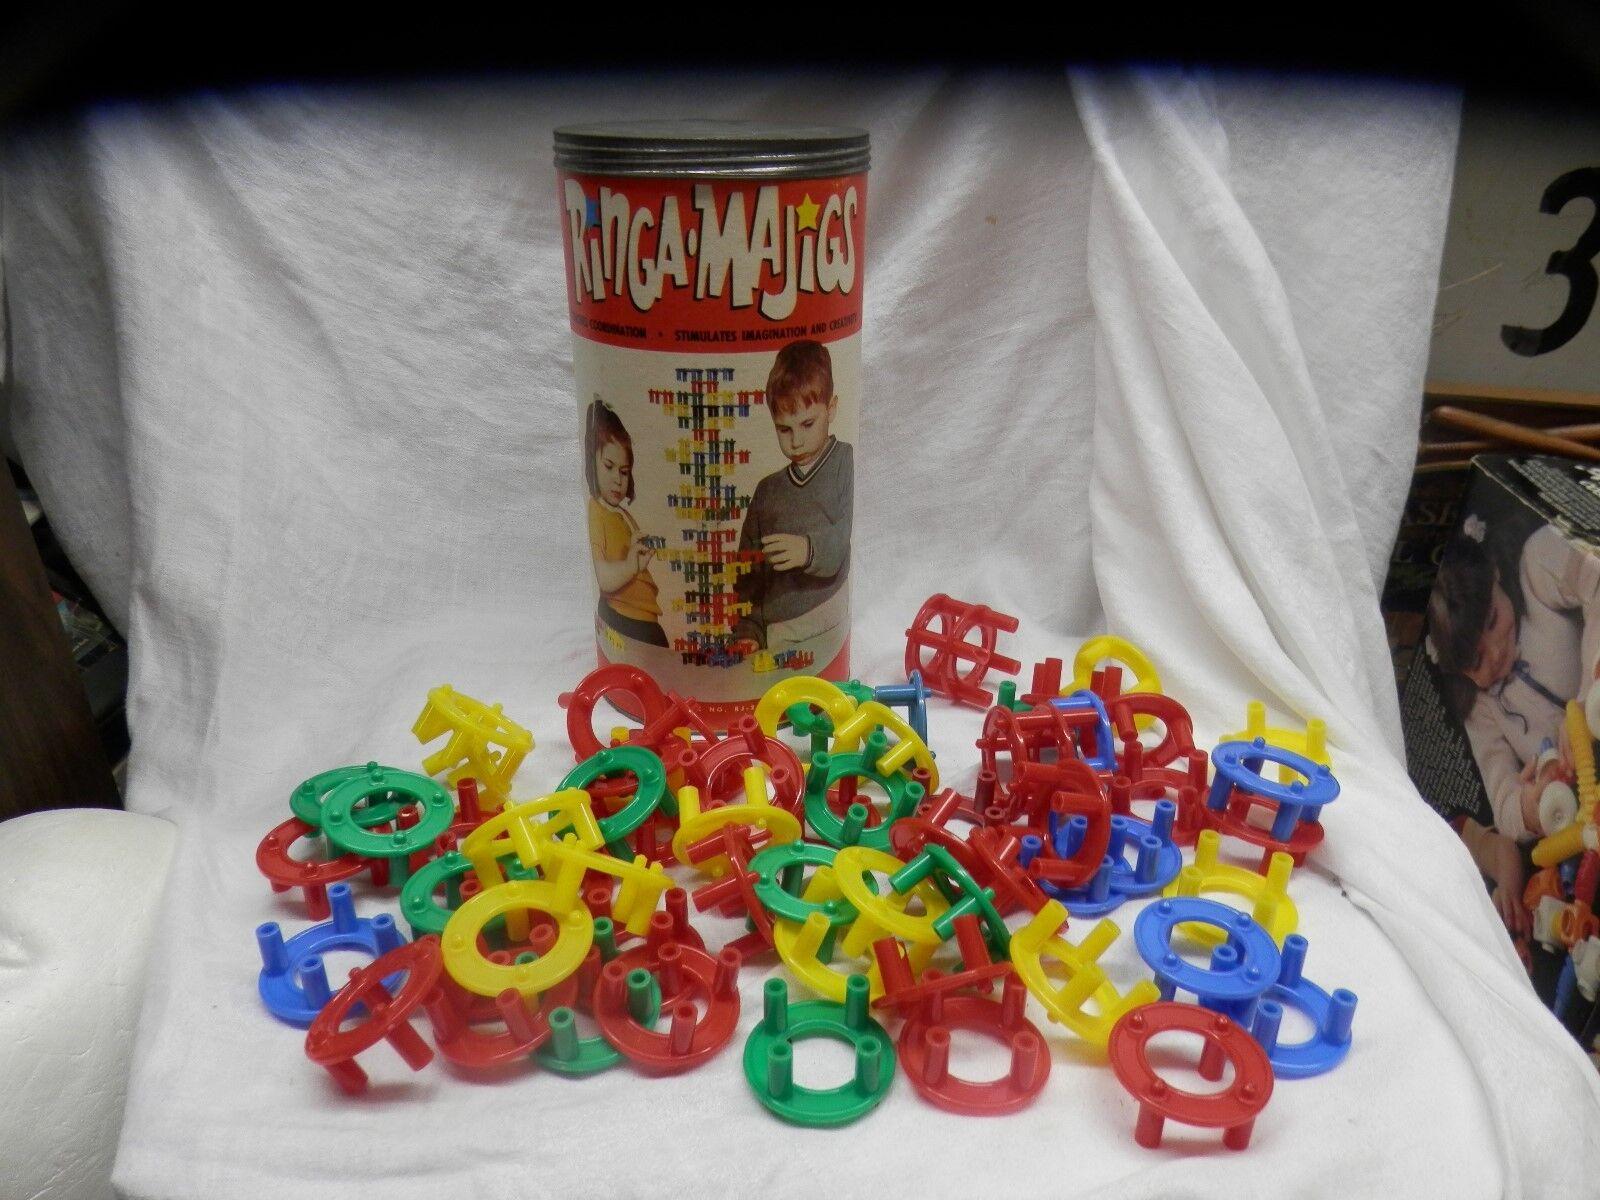 Rare 1960s Ringa Majics Willmar Minnesota molenaar inc building toy vintage cool